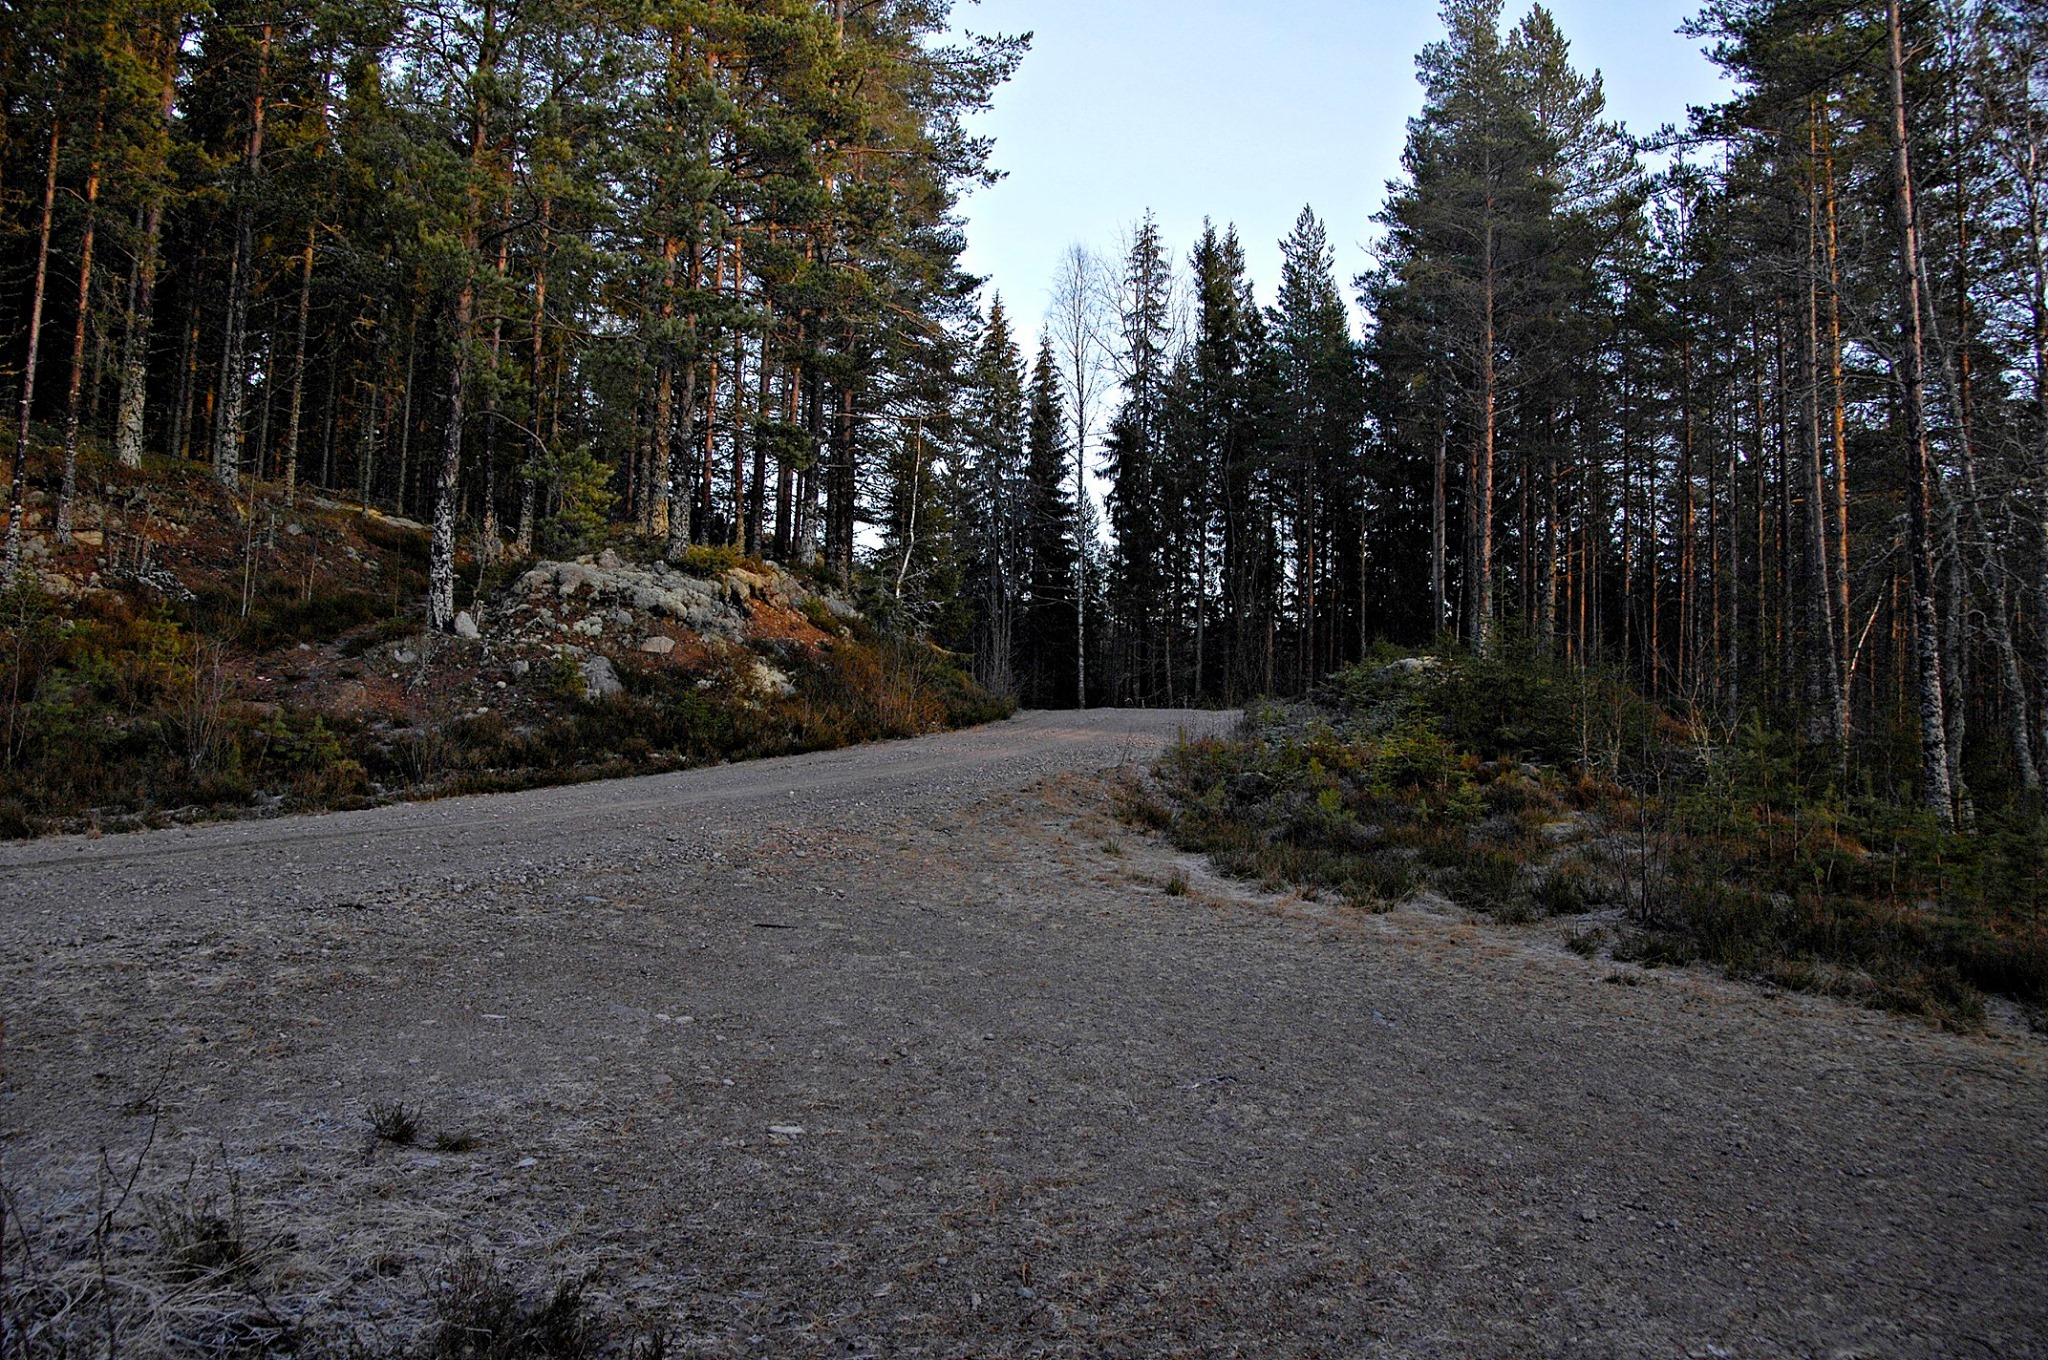 World Rally Championship: Temporada 2020 - Página 7 EOq_Y26WoAAHVrP?format=jpg&name=4096x4096